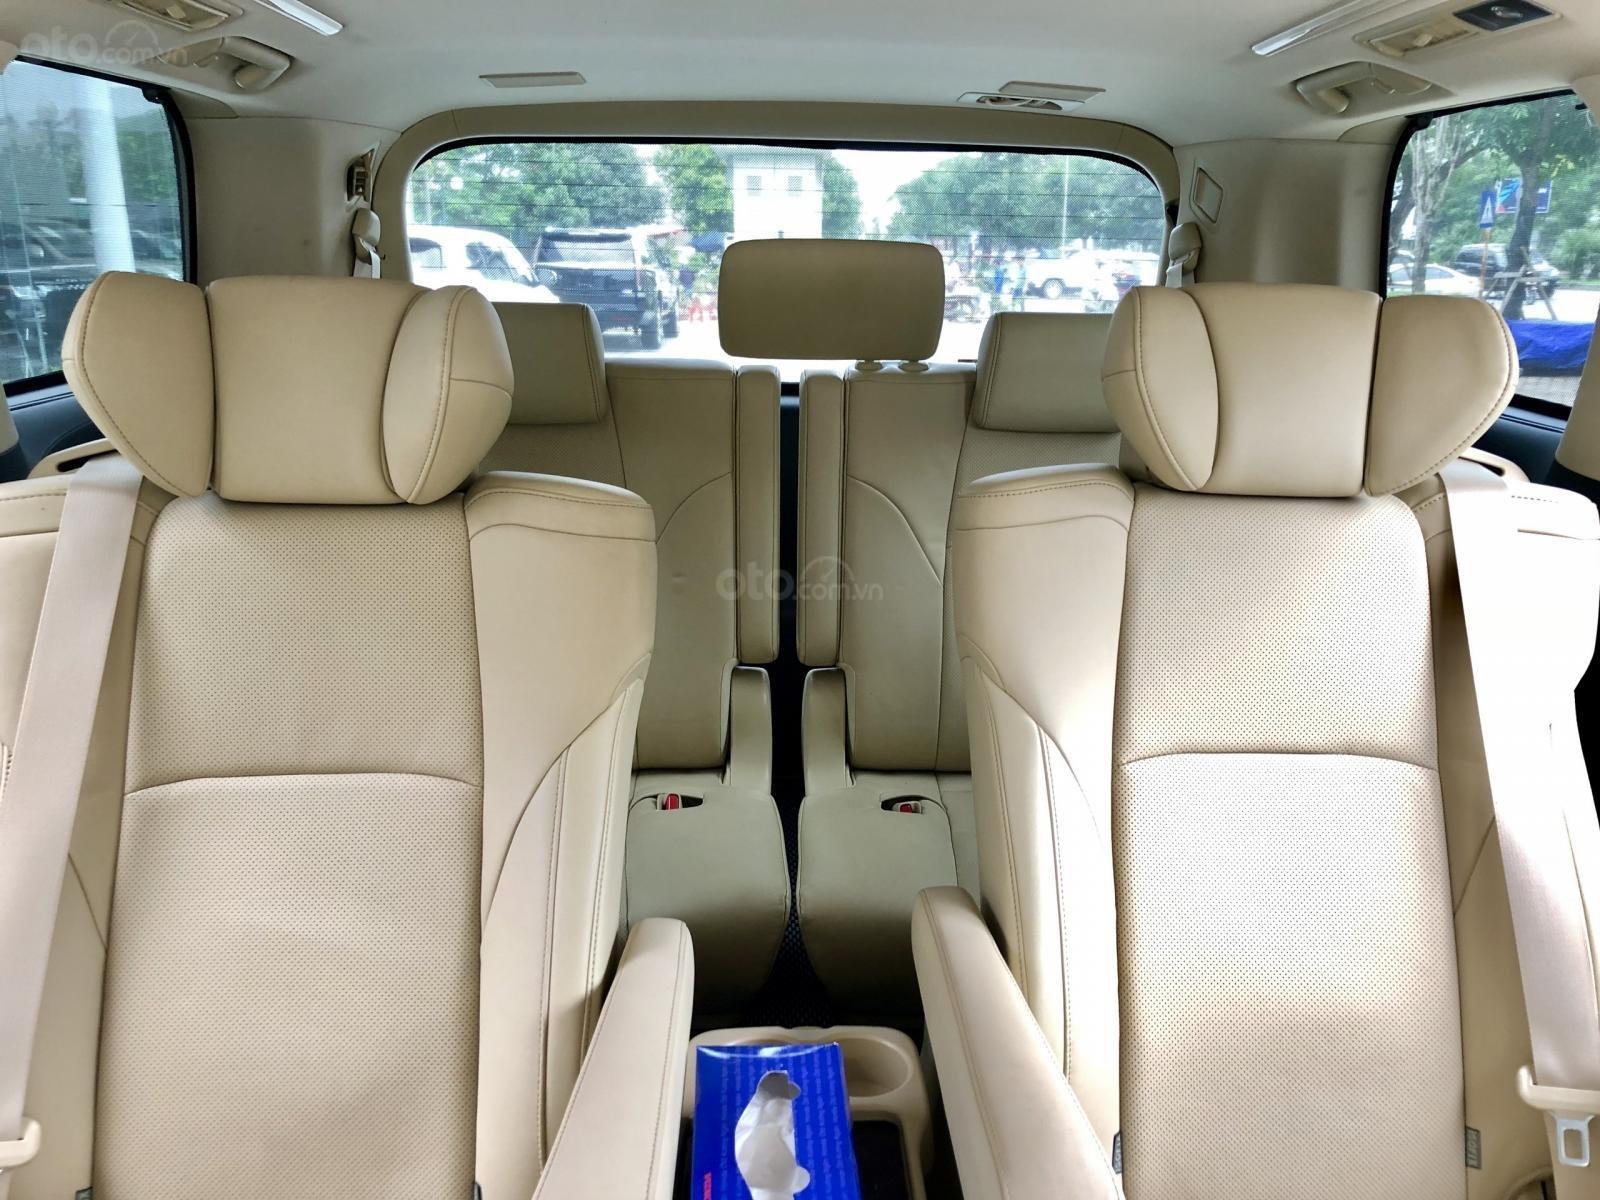 Bán Toyota Alphard 3.5L - V6 sản xuất 2017 model 2018, Mr Huân 0981010161 (13)